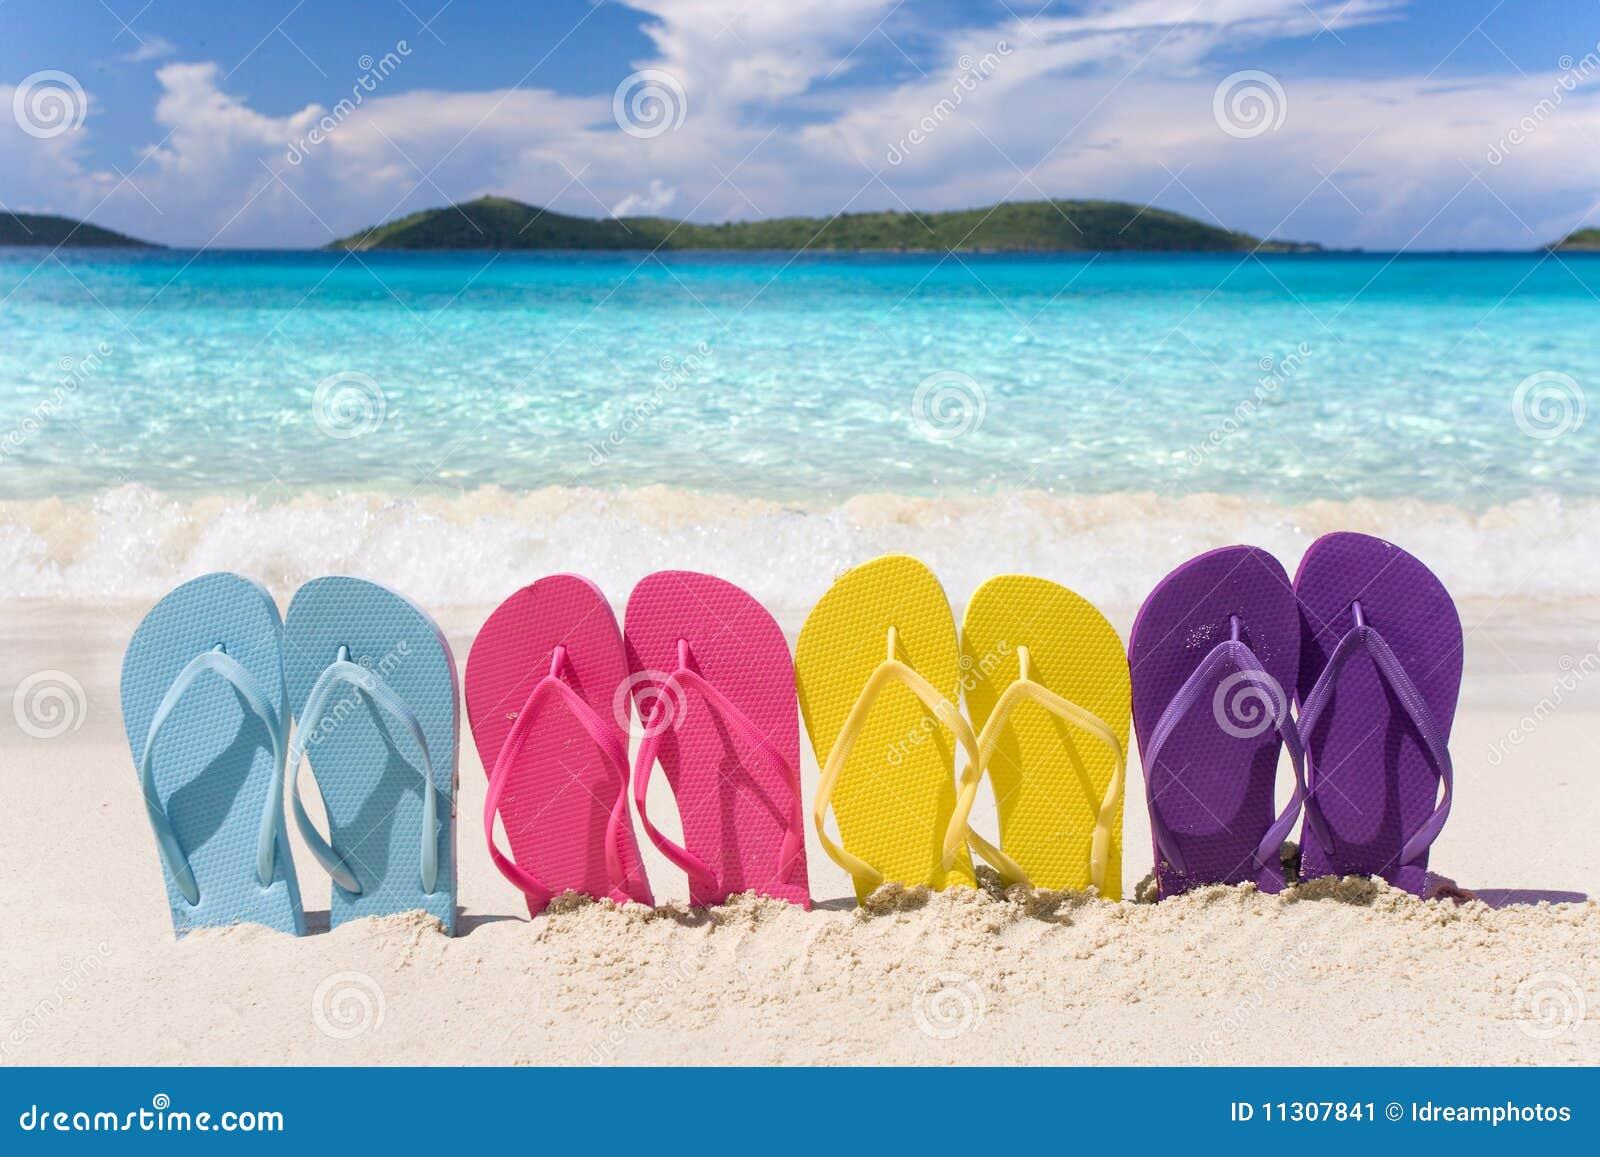 Rainbow flip flops beach